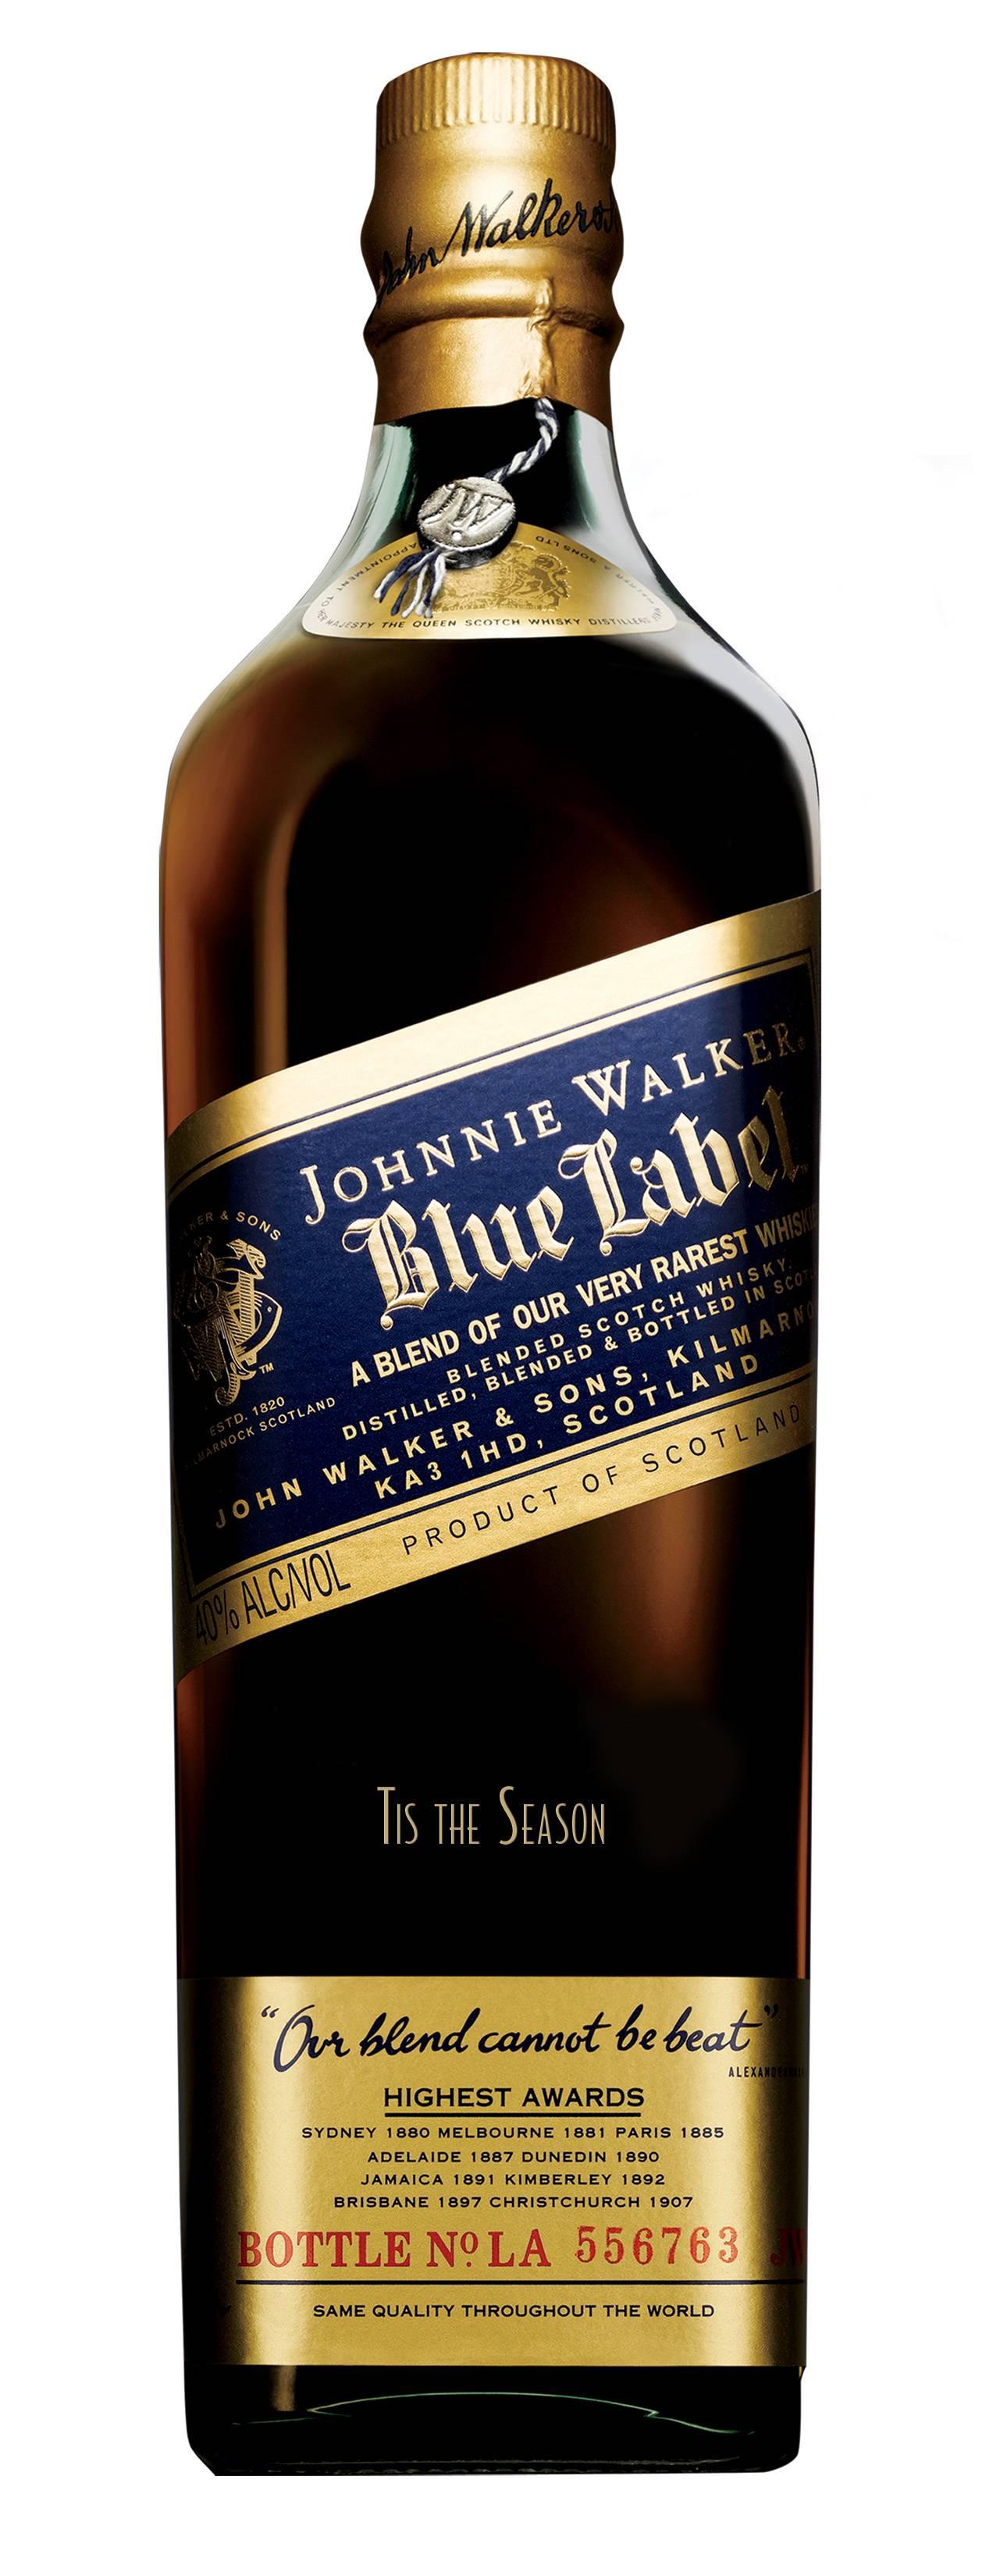 Haute Gift Guide An Engraved Bottle Of Johnnie Walker